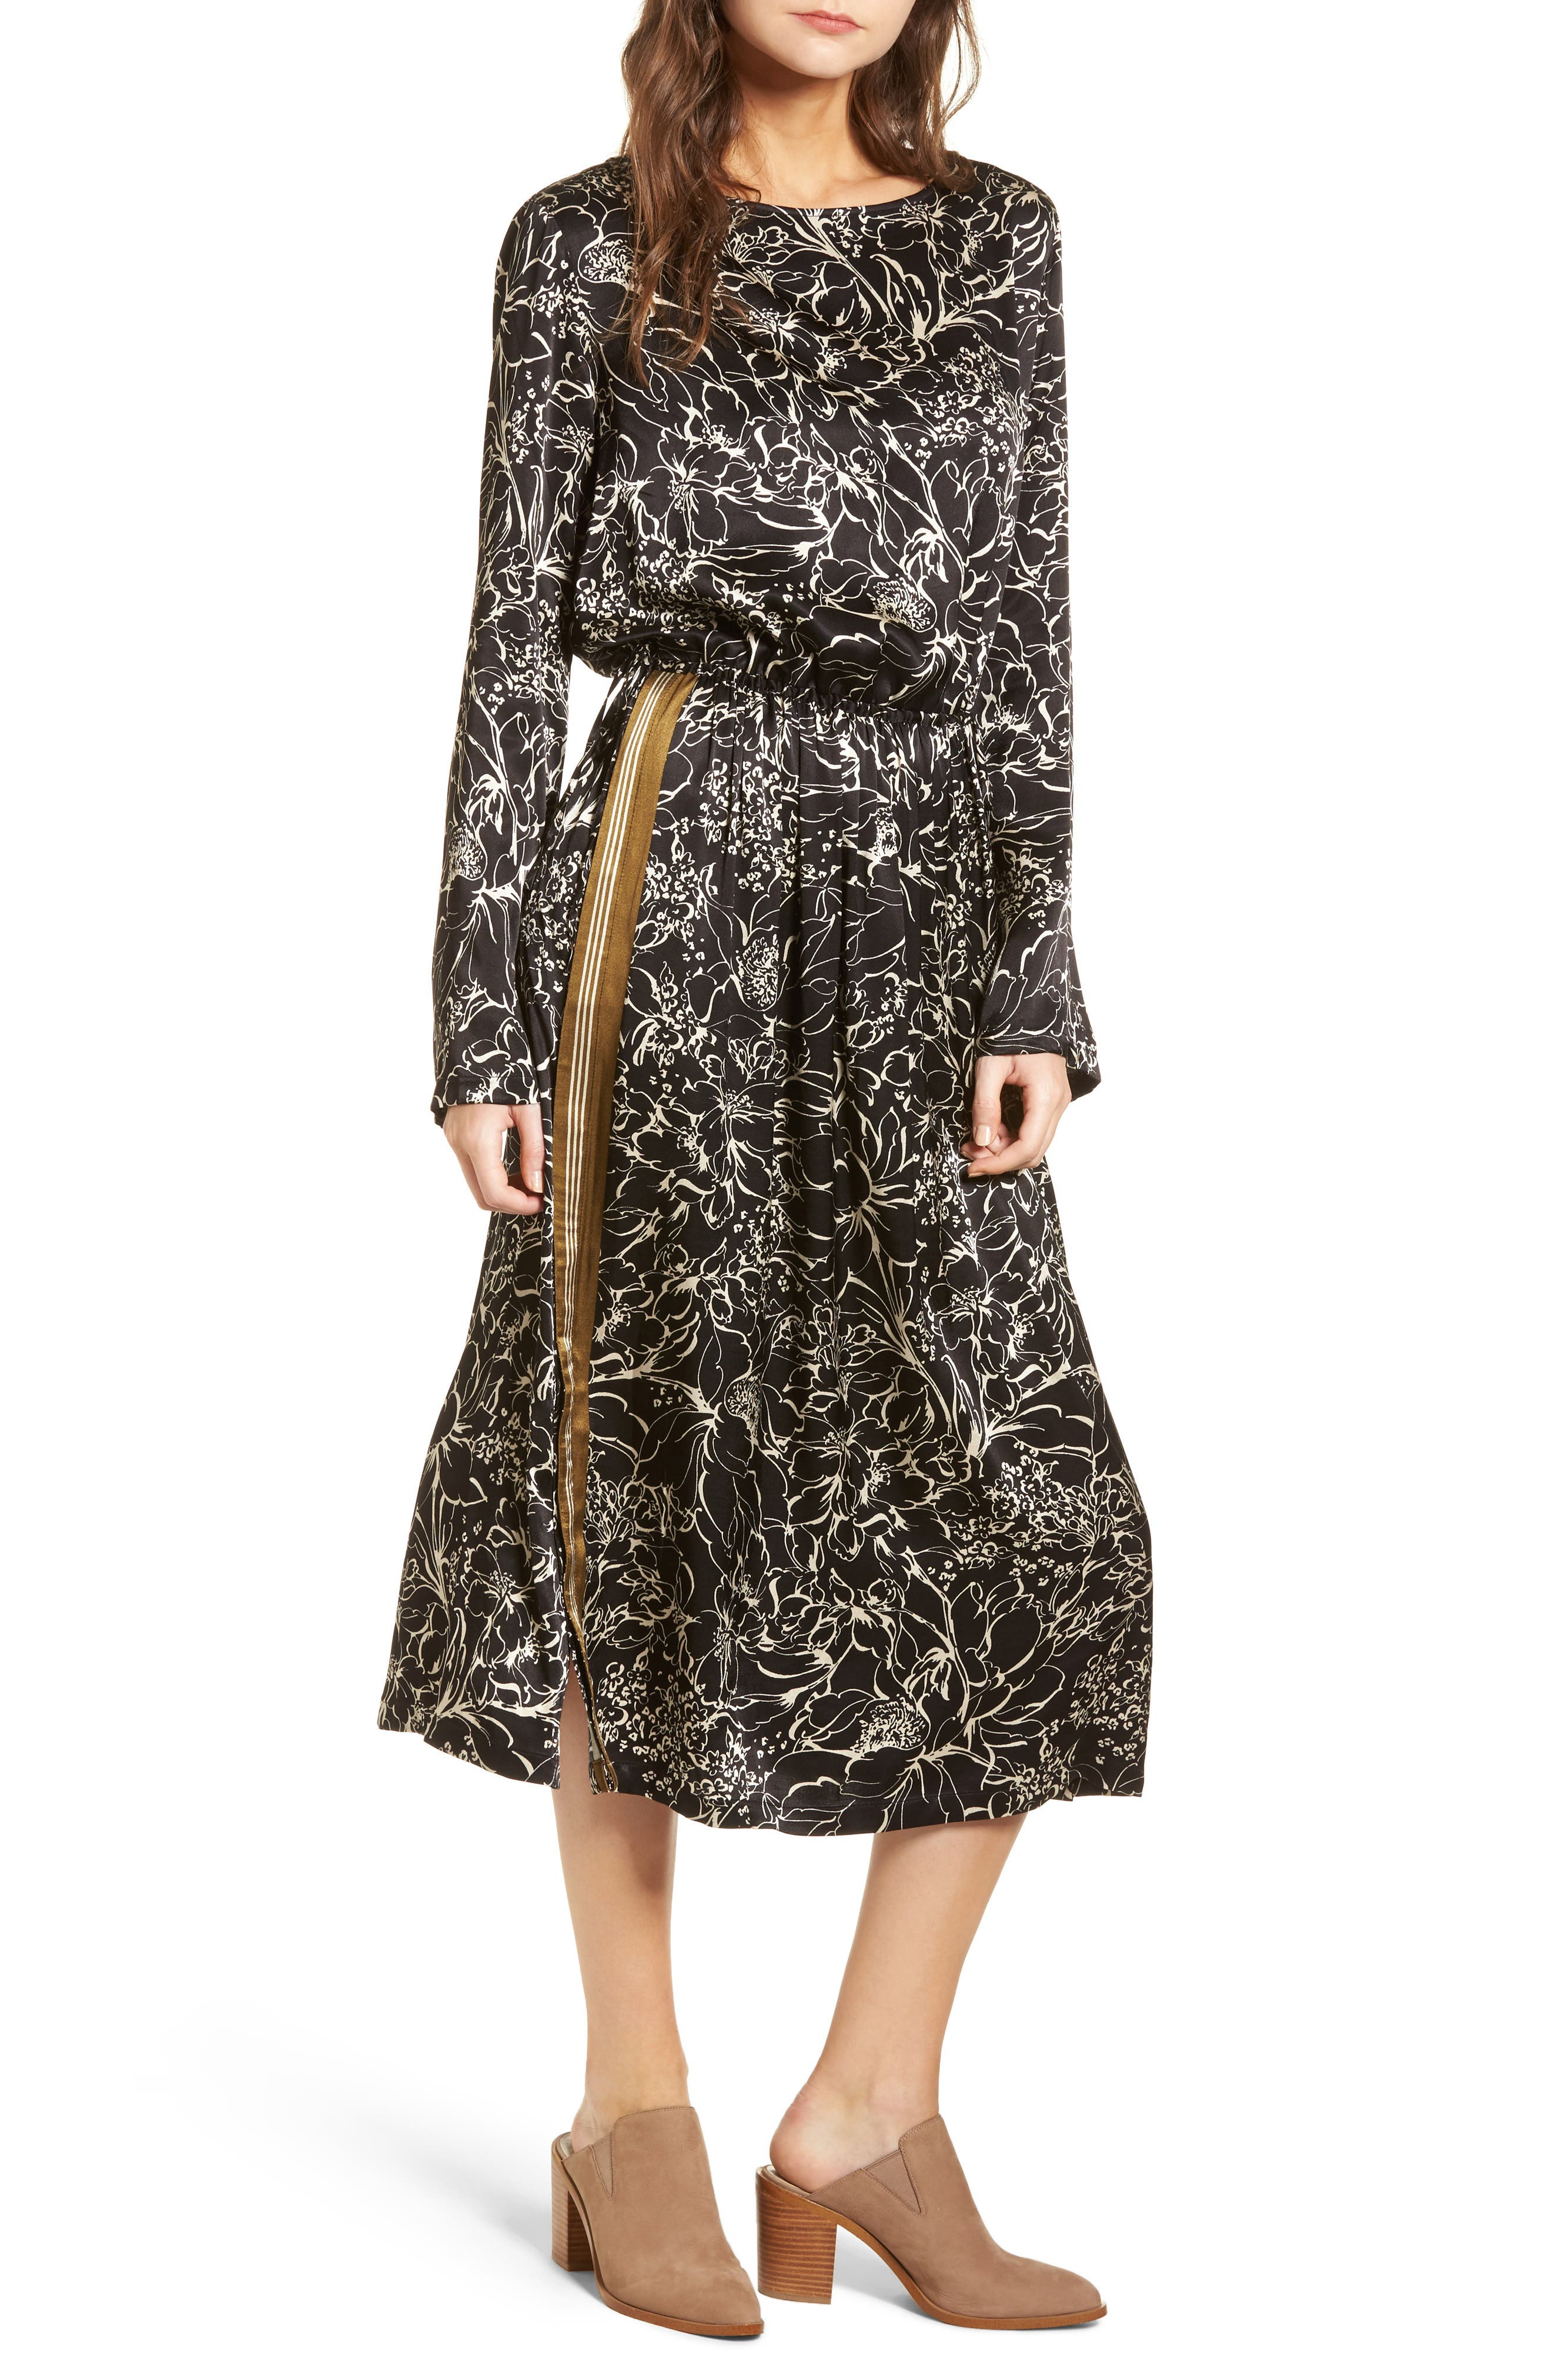 Alternate Image 1 Selected - Treasure & Bond Blouson Print Dress